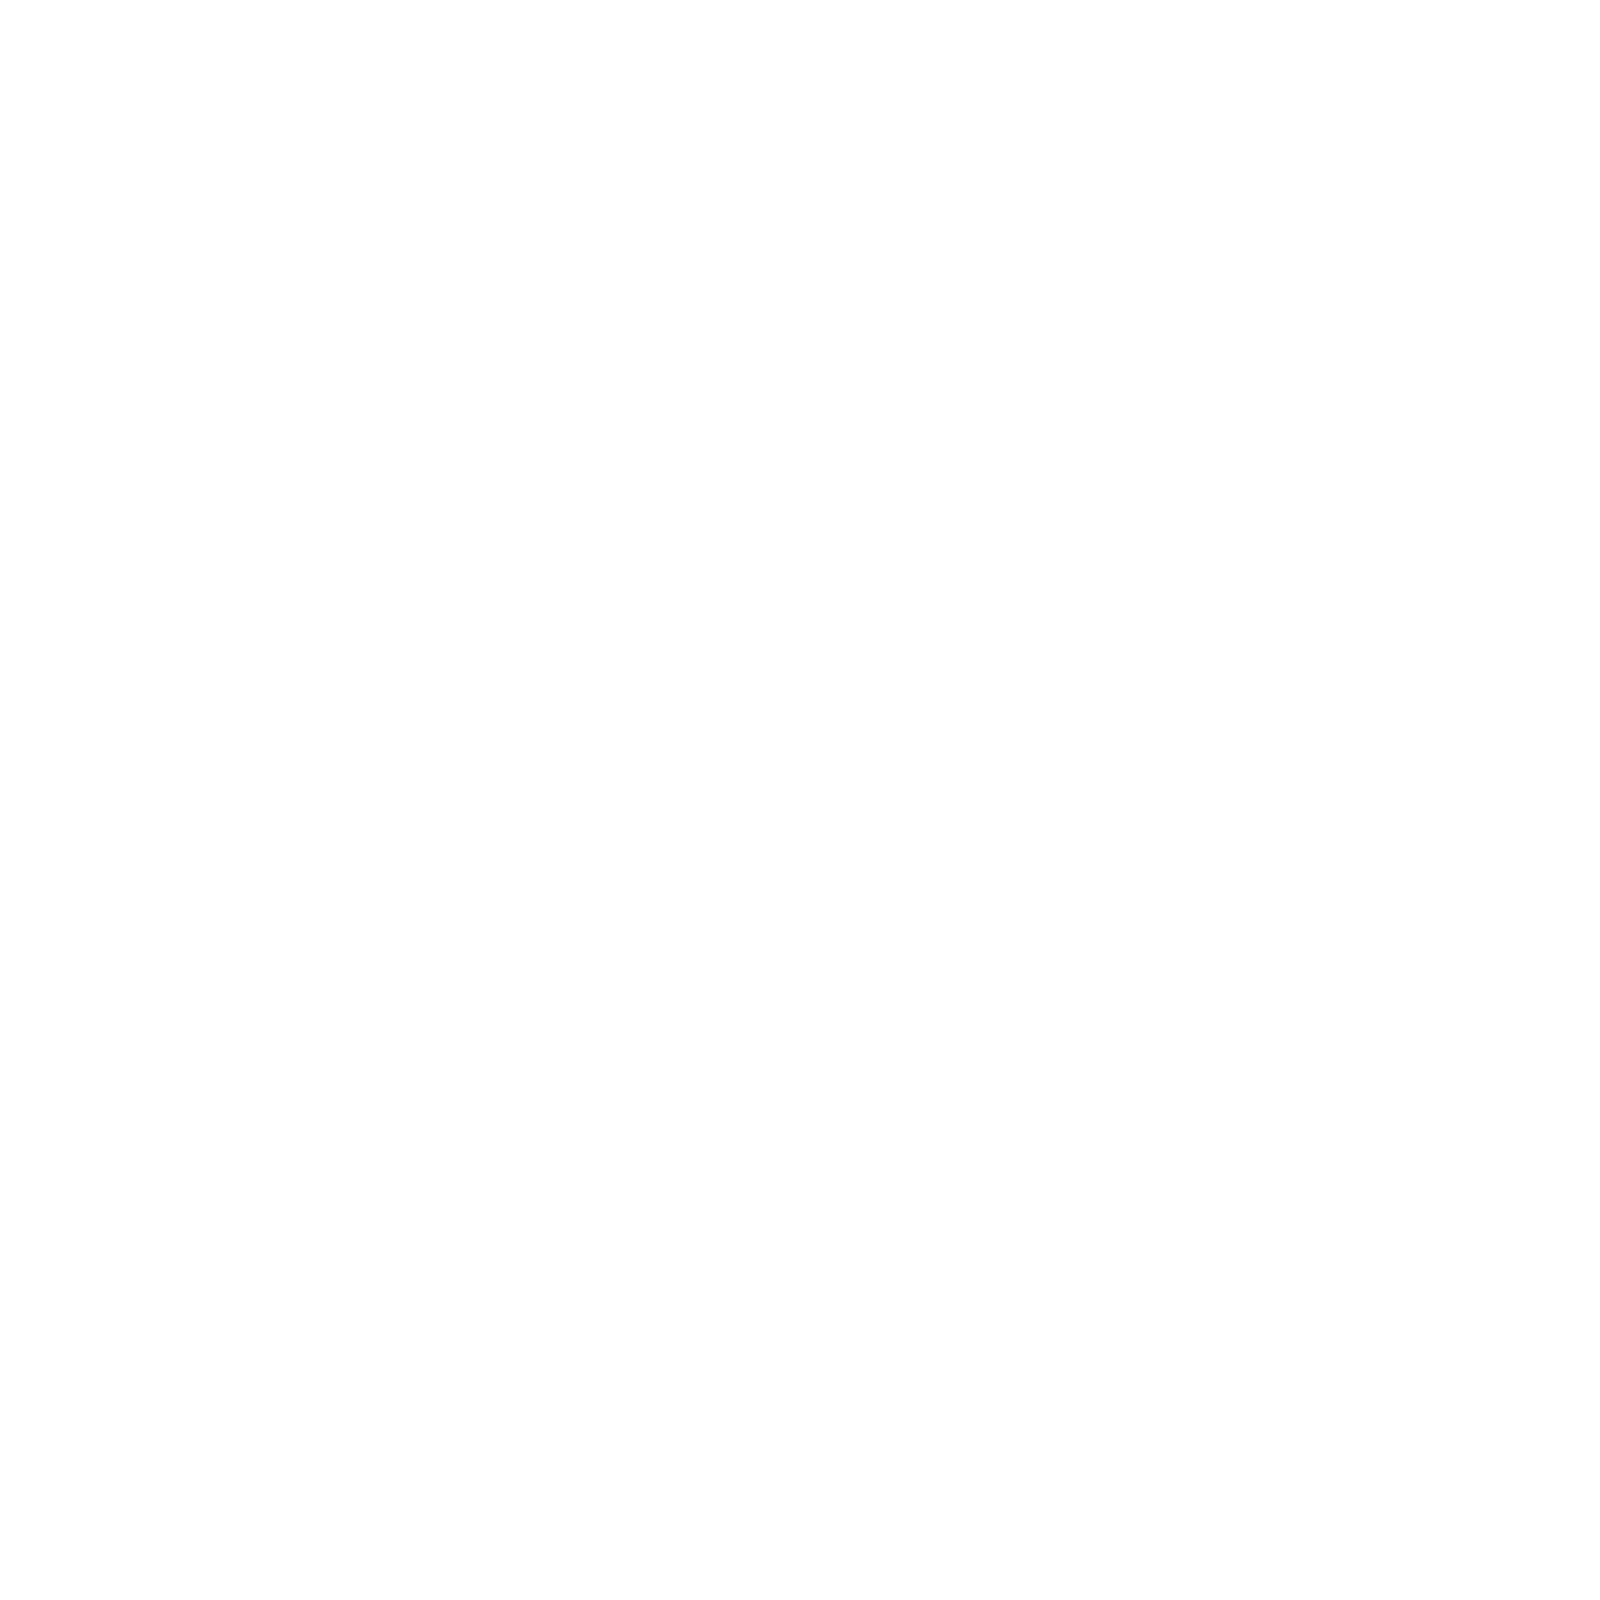 Under Armour - white